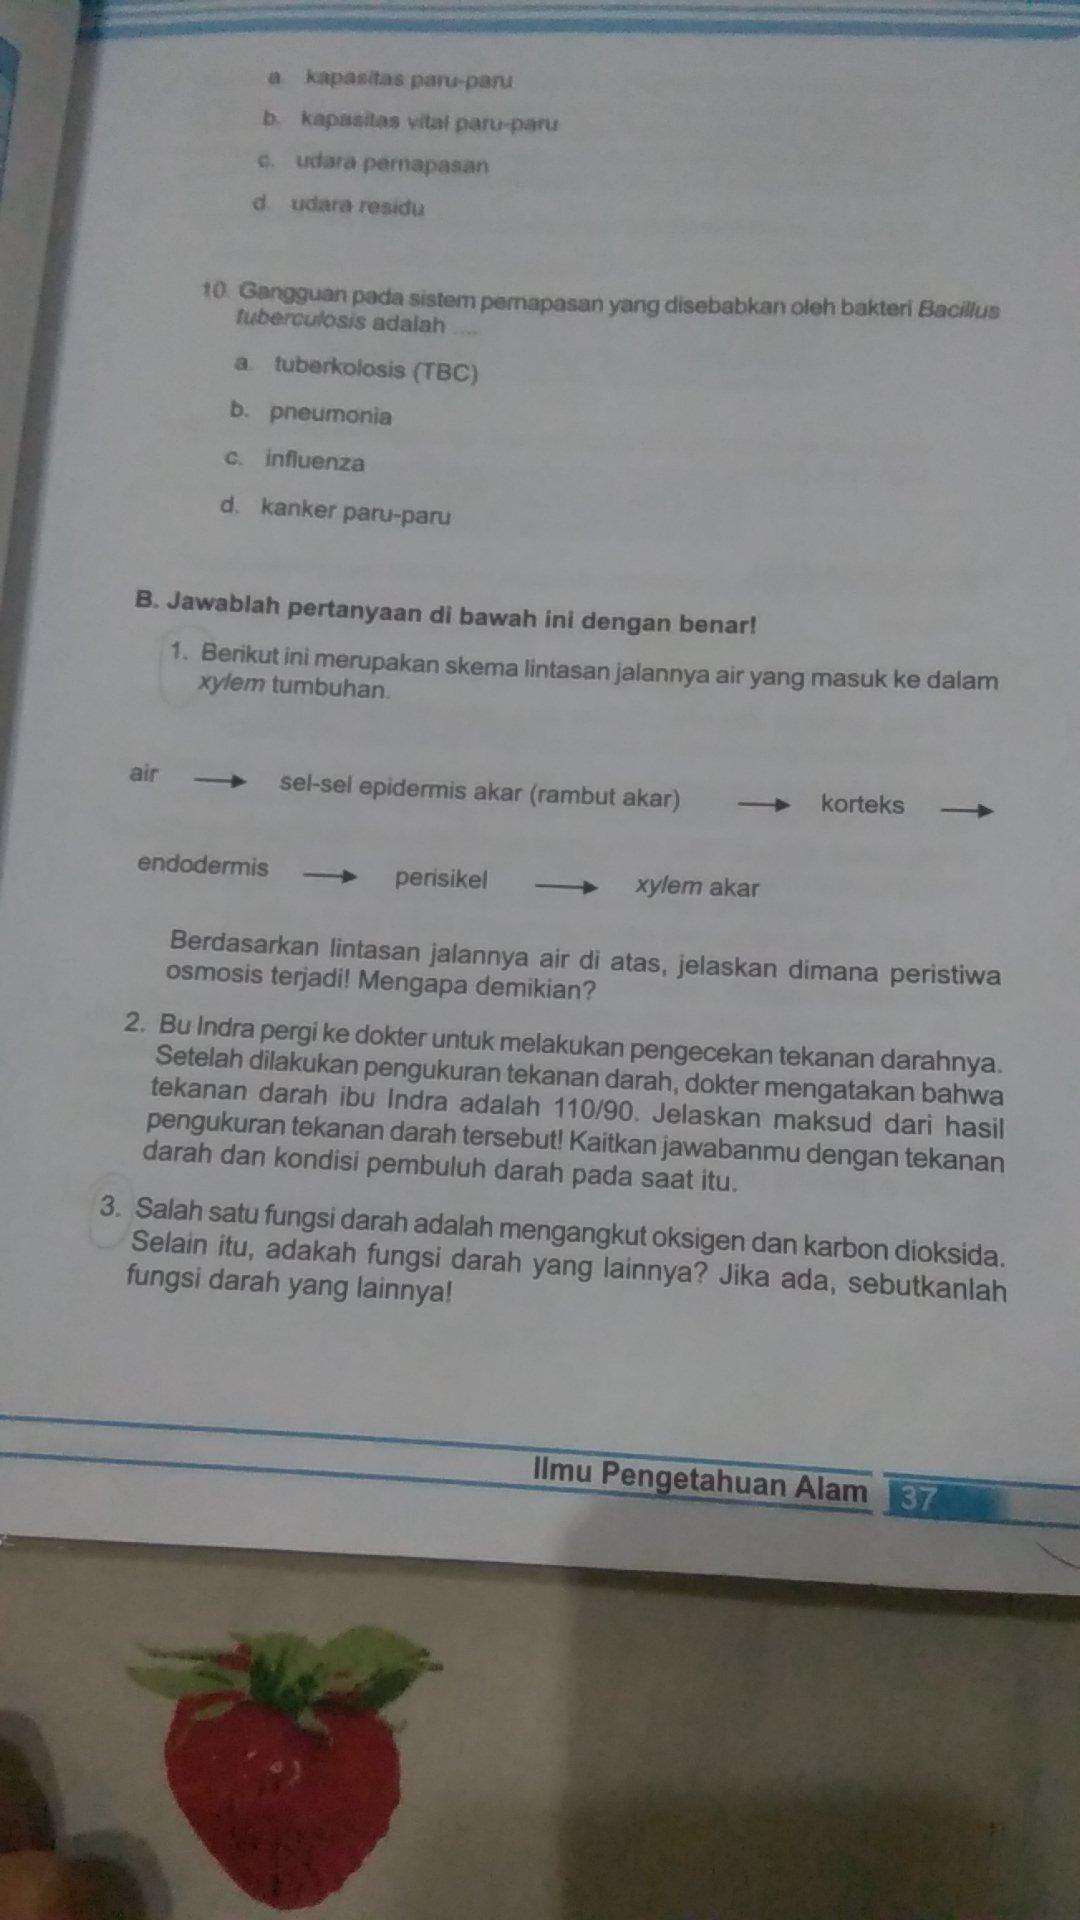 Jawaban Ipa Kelas 8 Semester 2 Halaman 38 Guru Ilmu Sosial